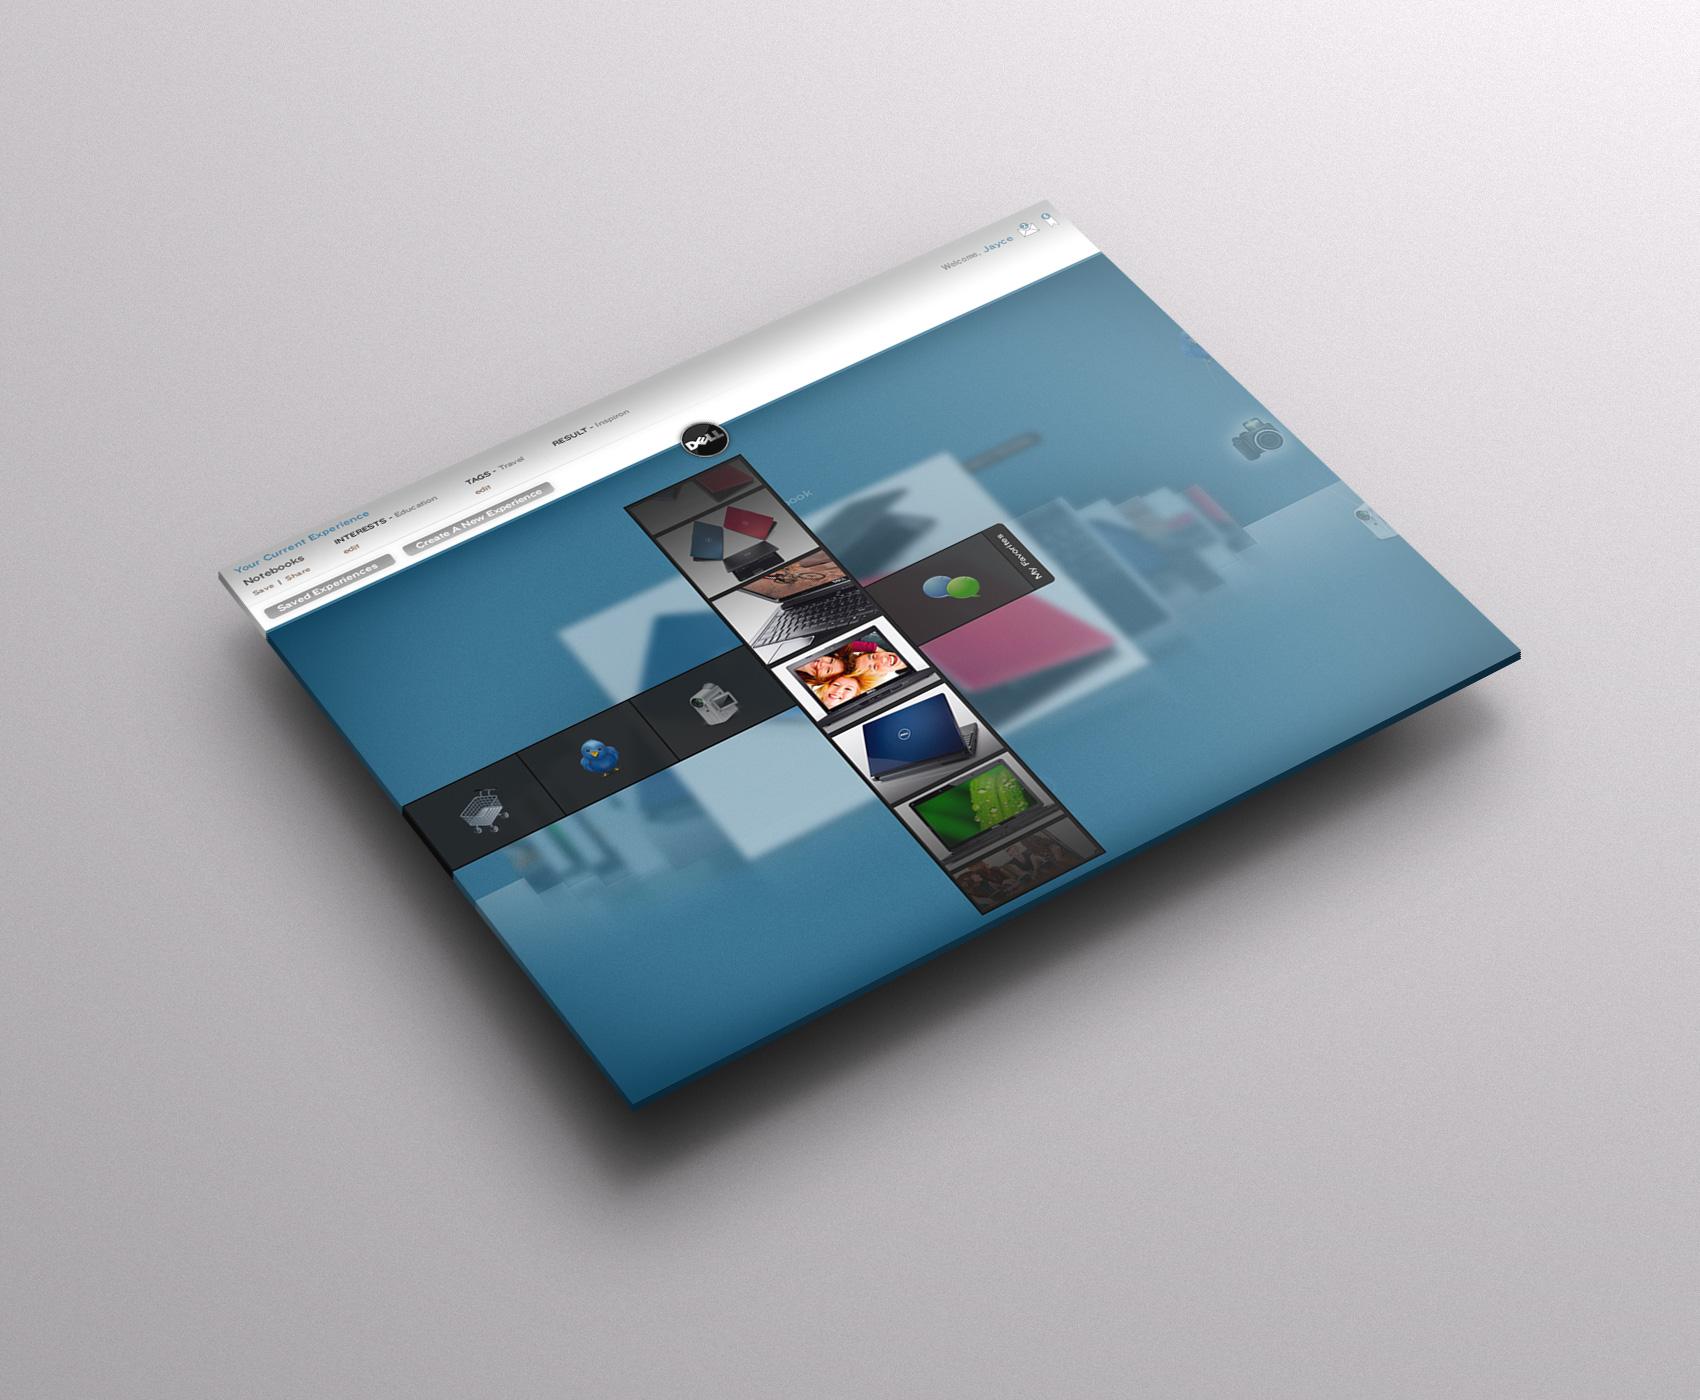 DellExperience-5.jpg